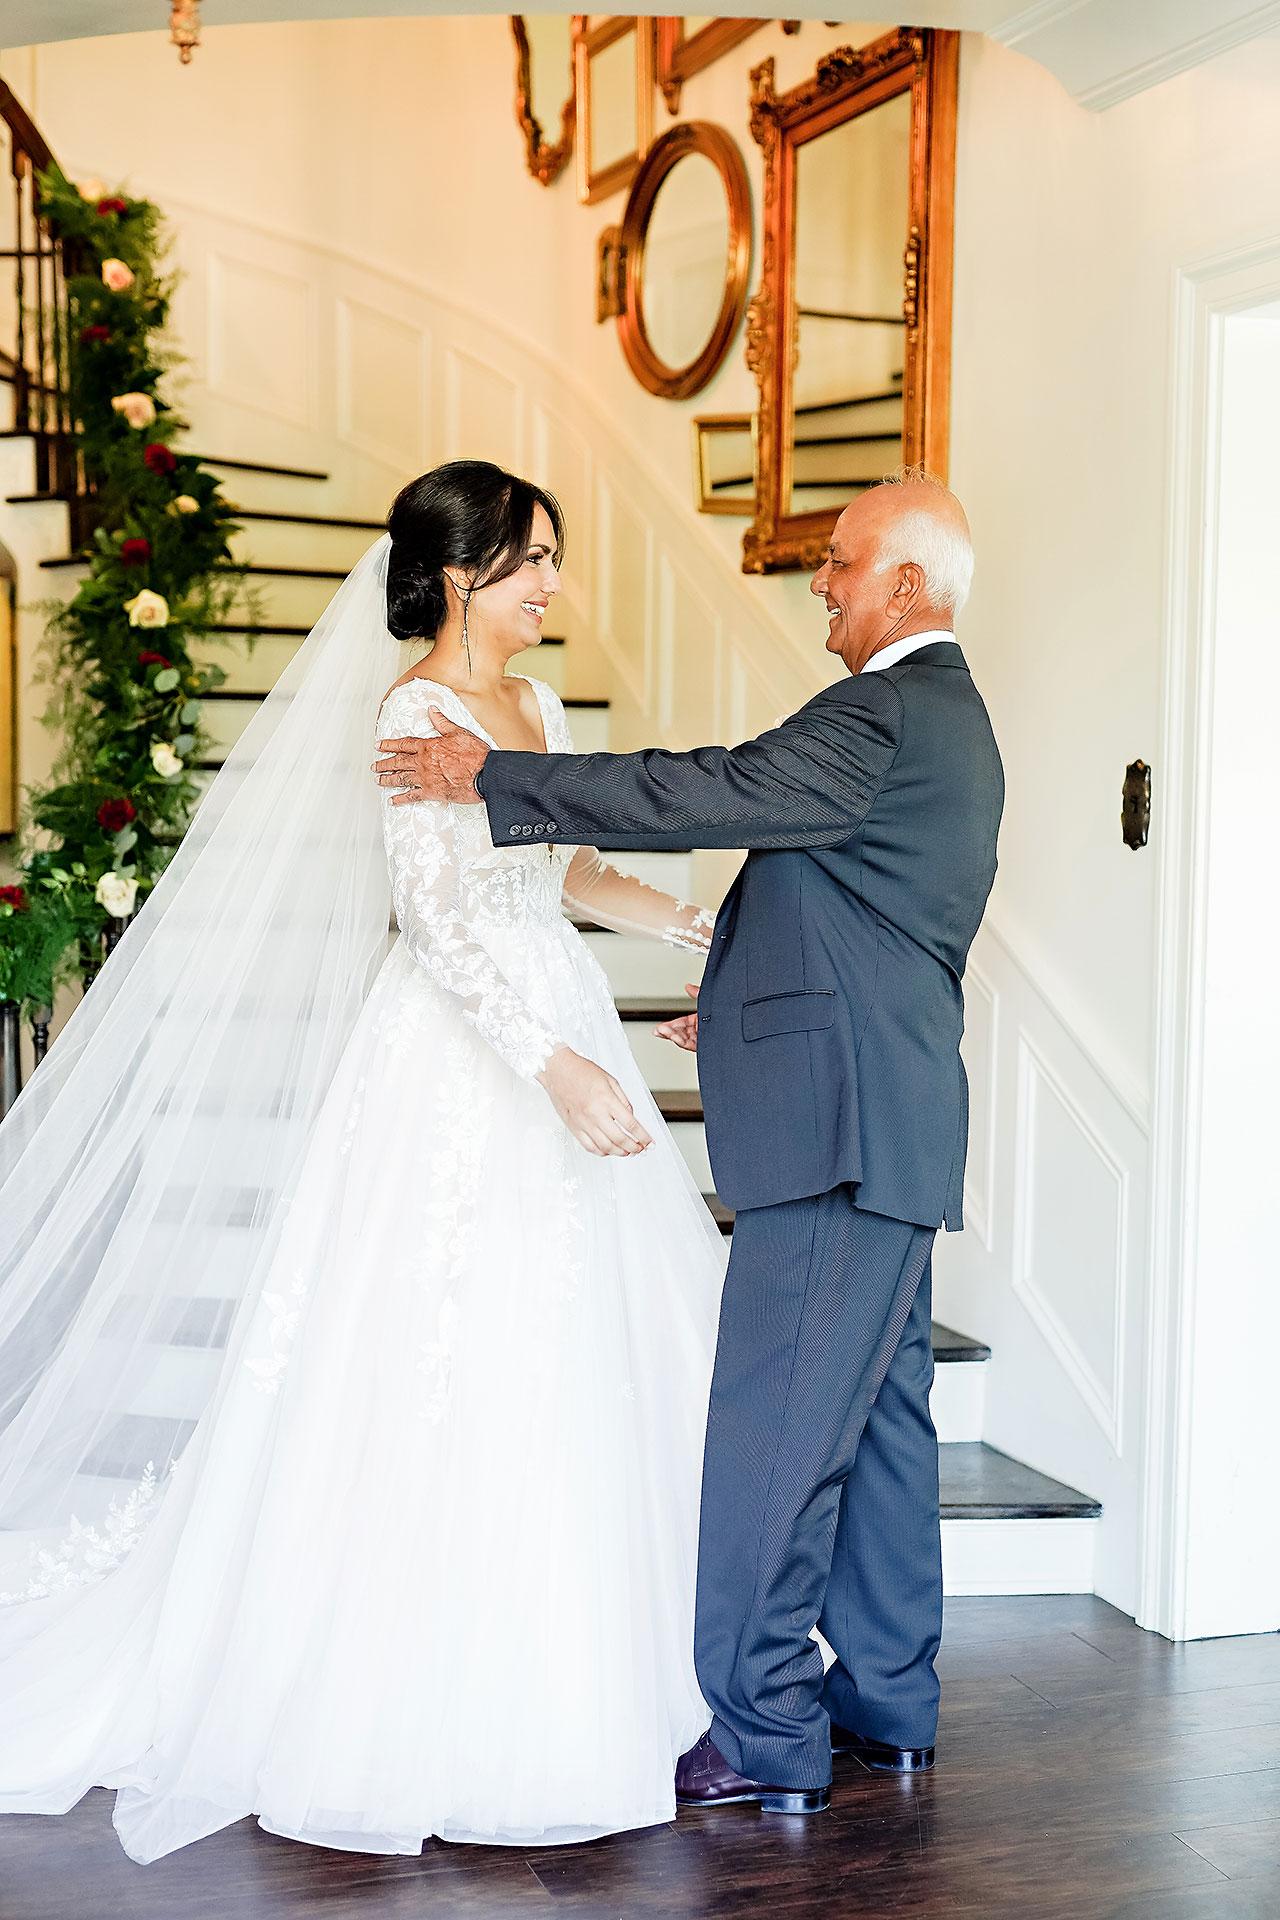 Nadia Parker Black Iris Estate Carmel Indiana Wedding May 2021 129